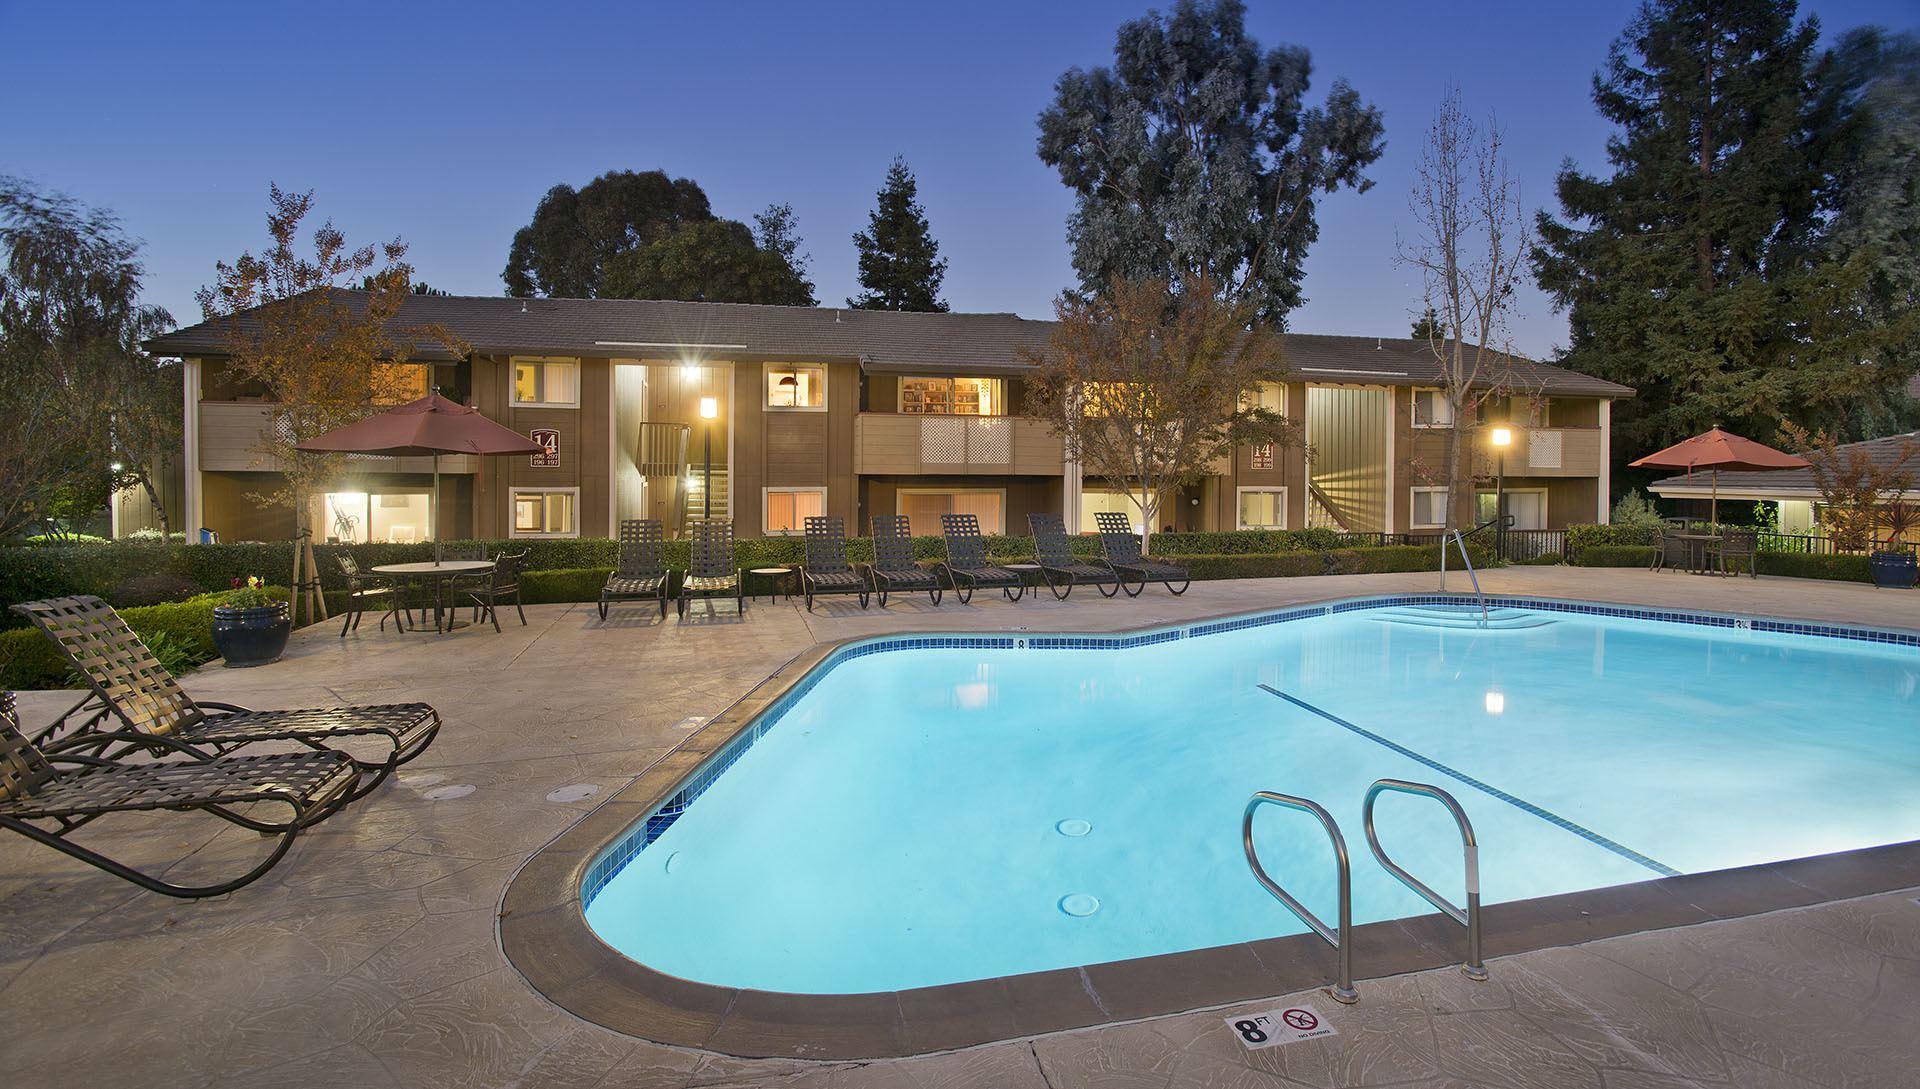 Apartments in Cupertino, CA